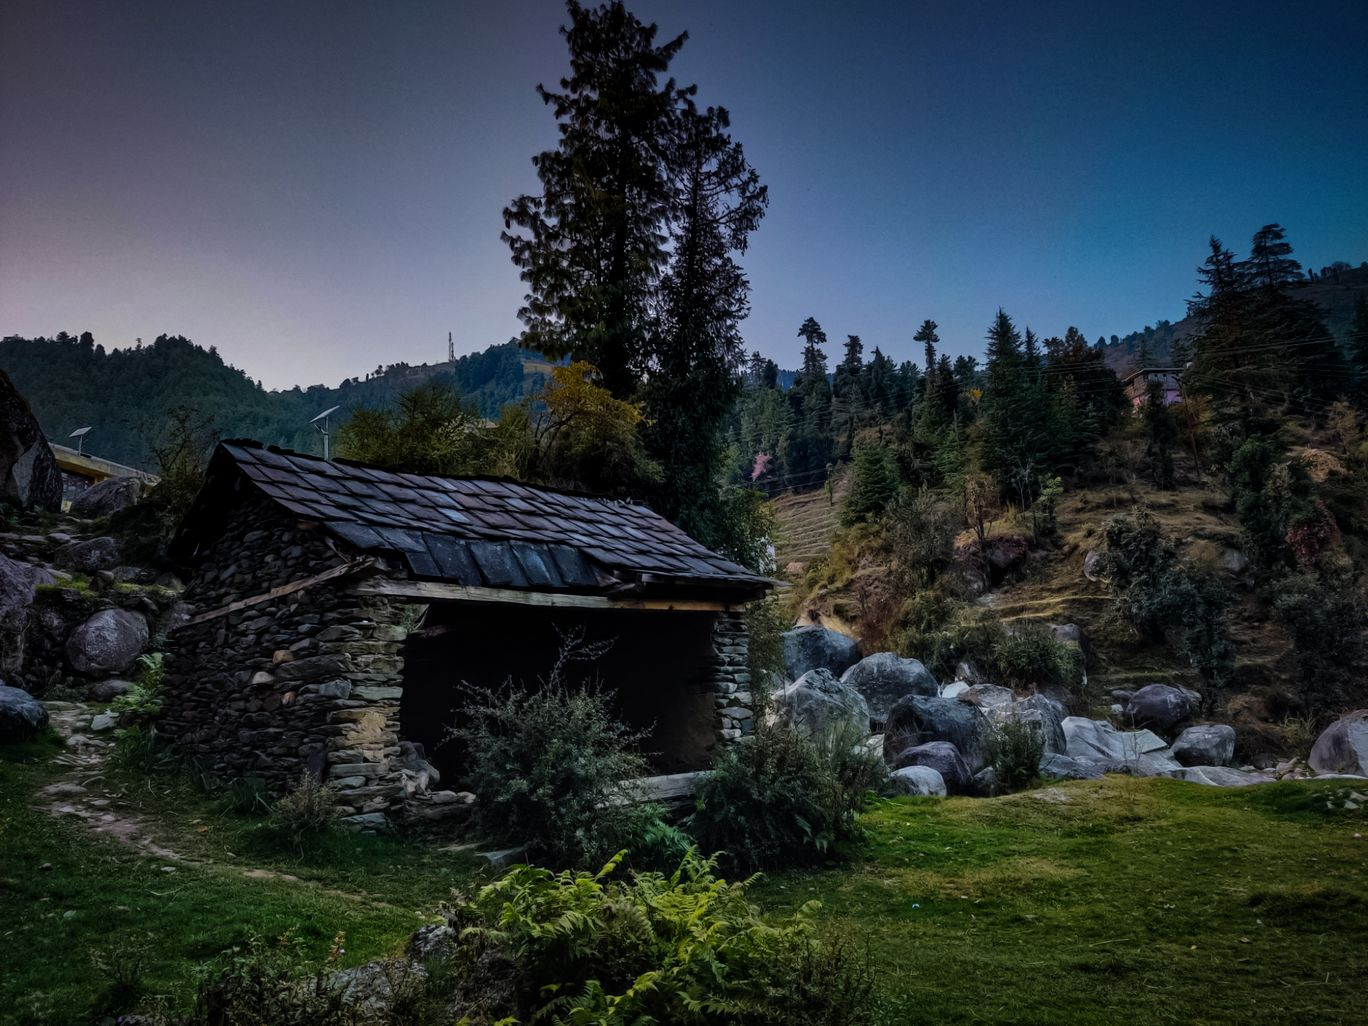 Photo of Bagsiad By daksh thakur